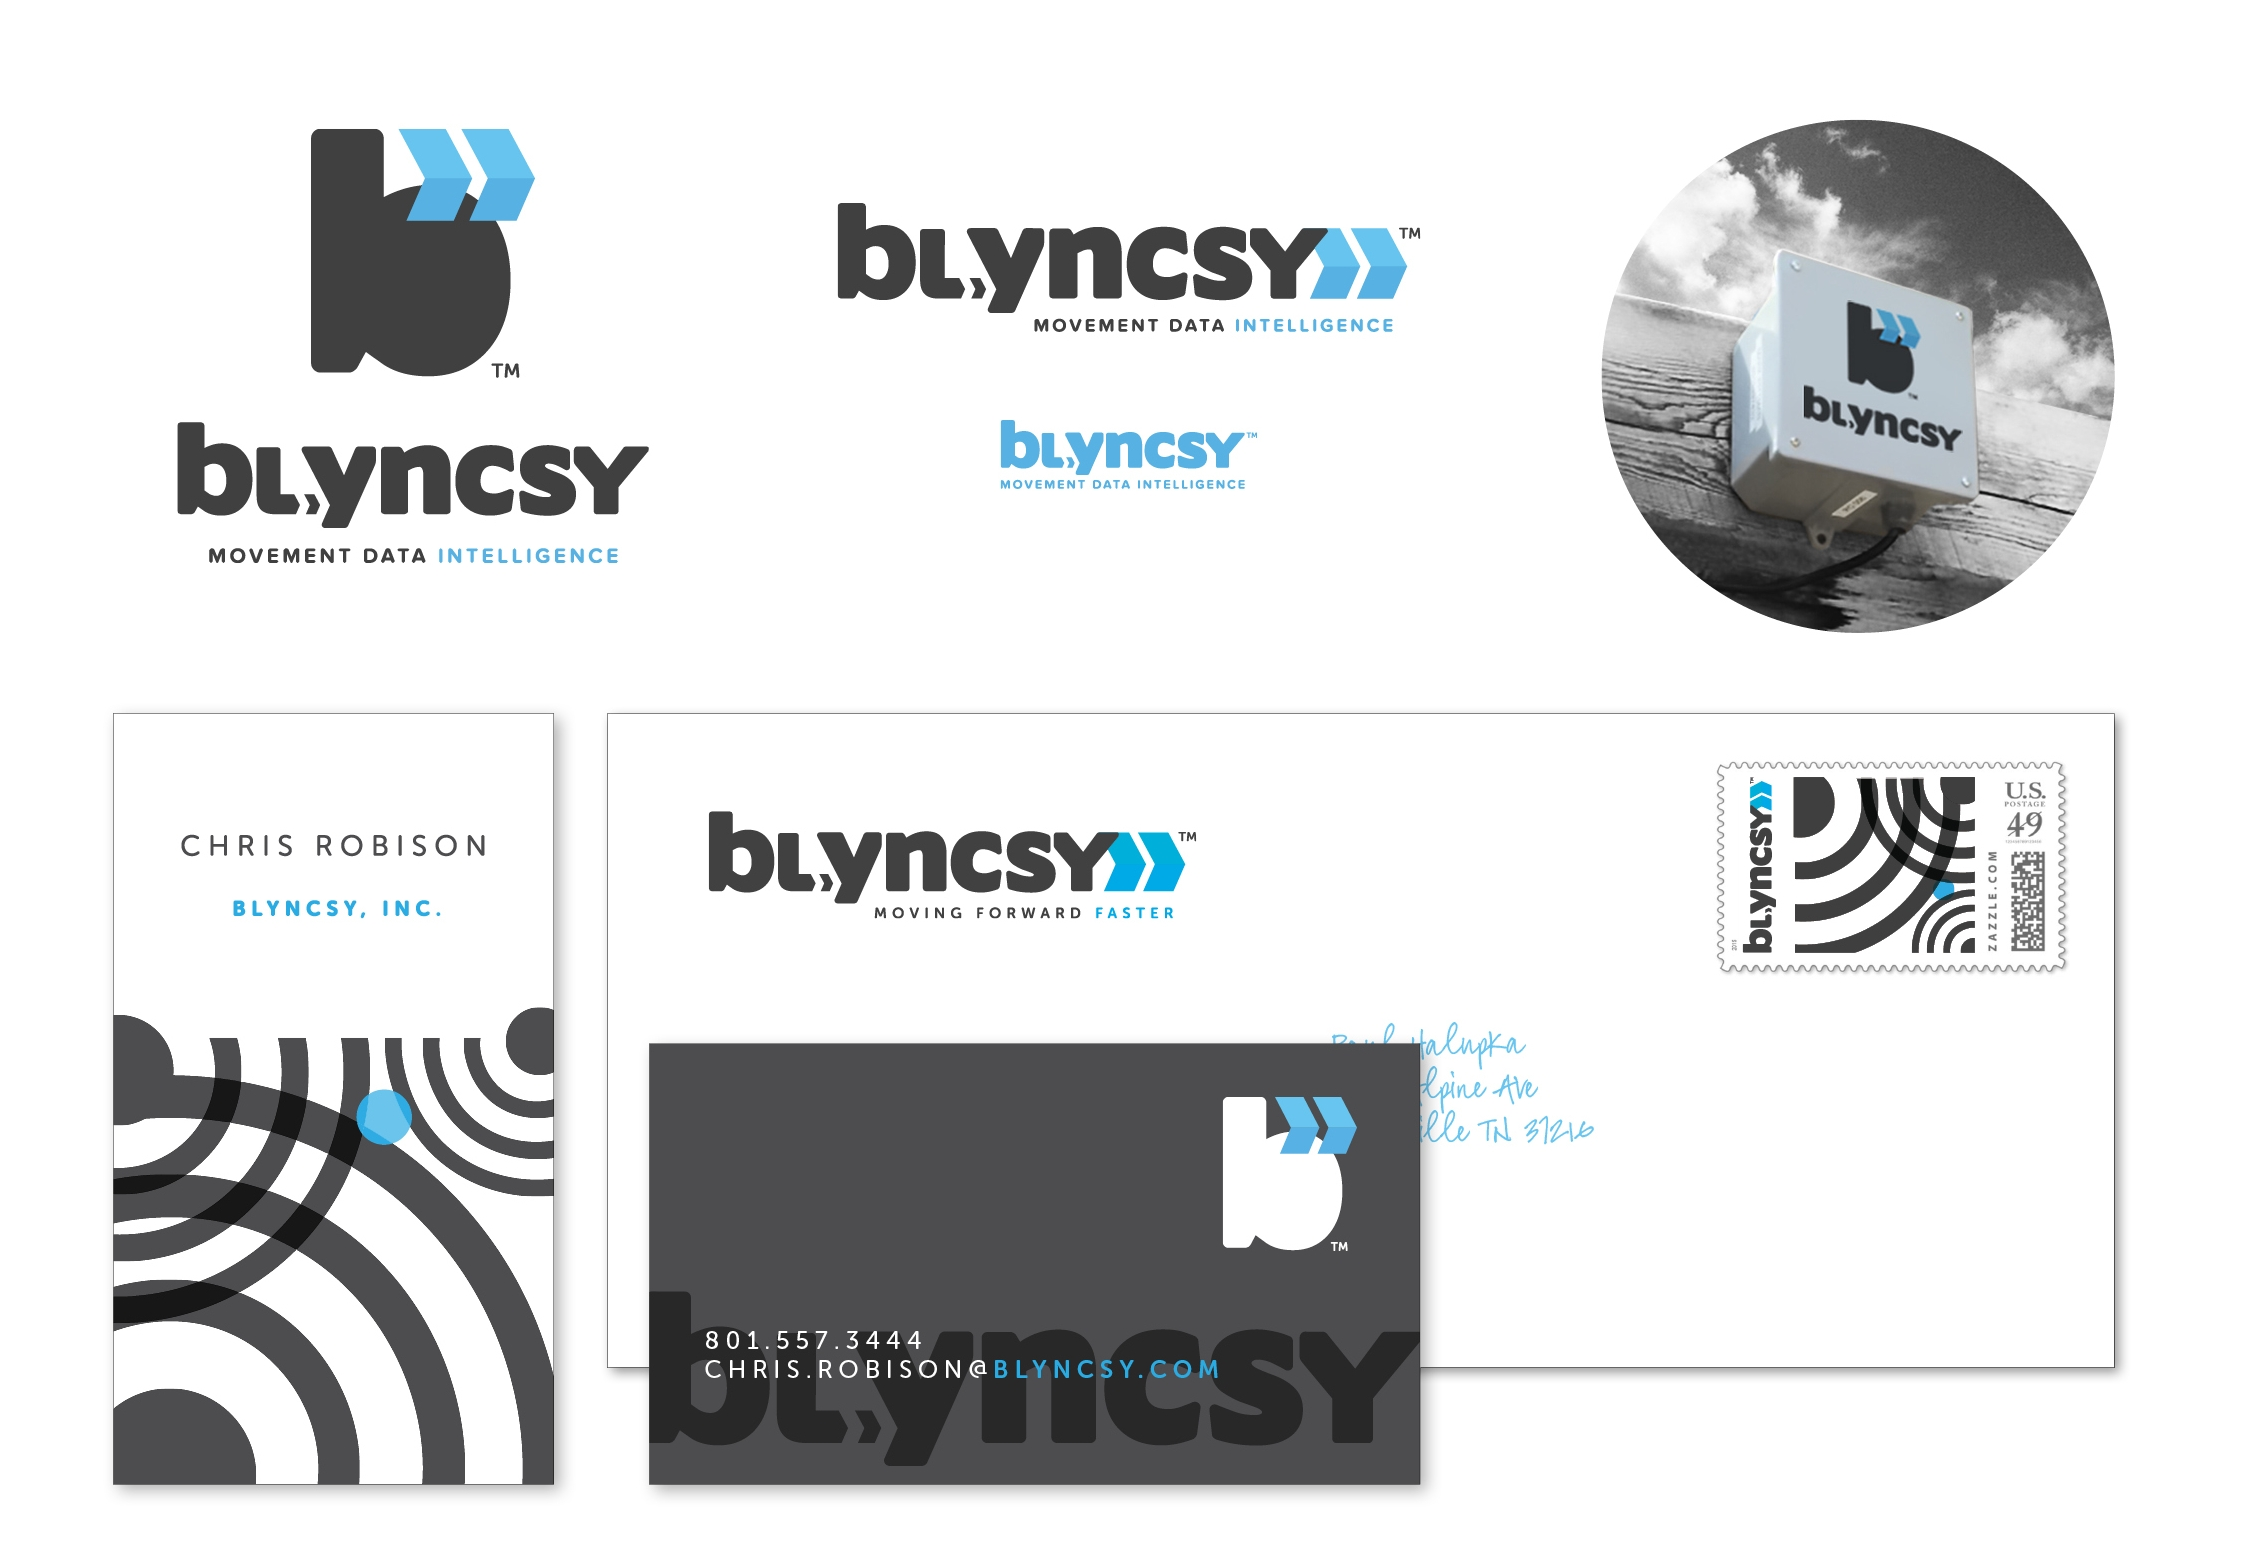 blyncsy: brand suite